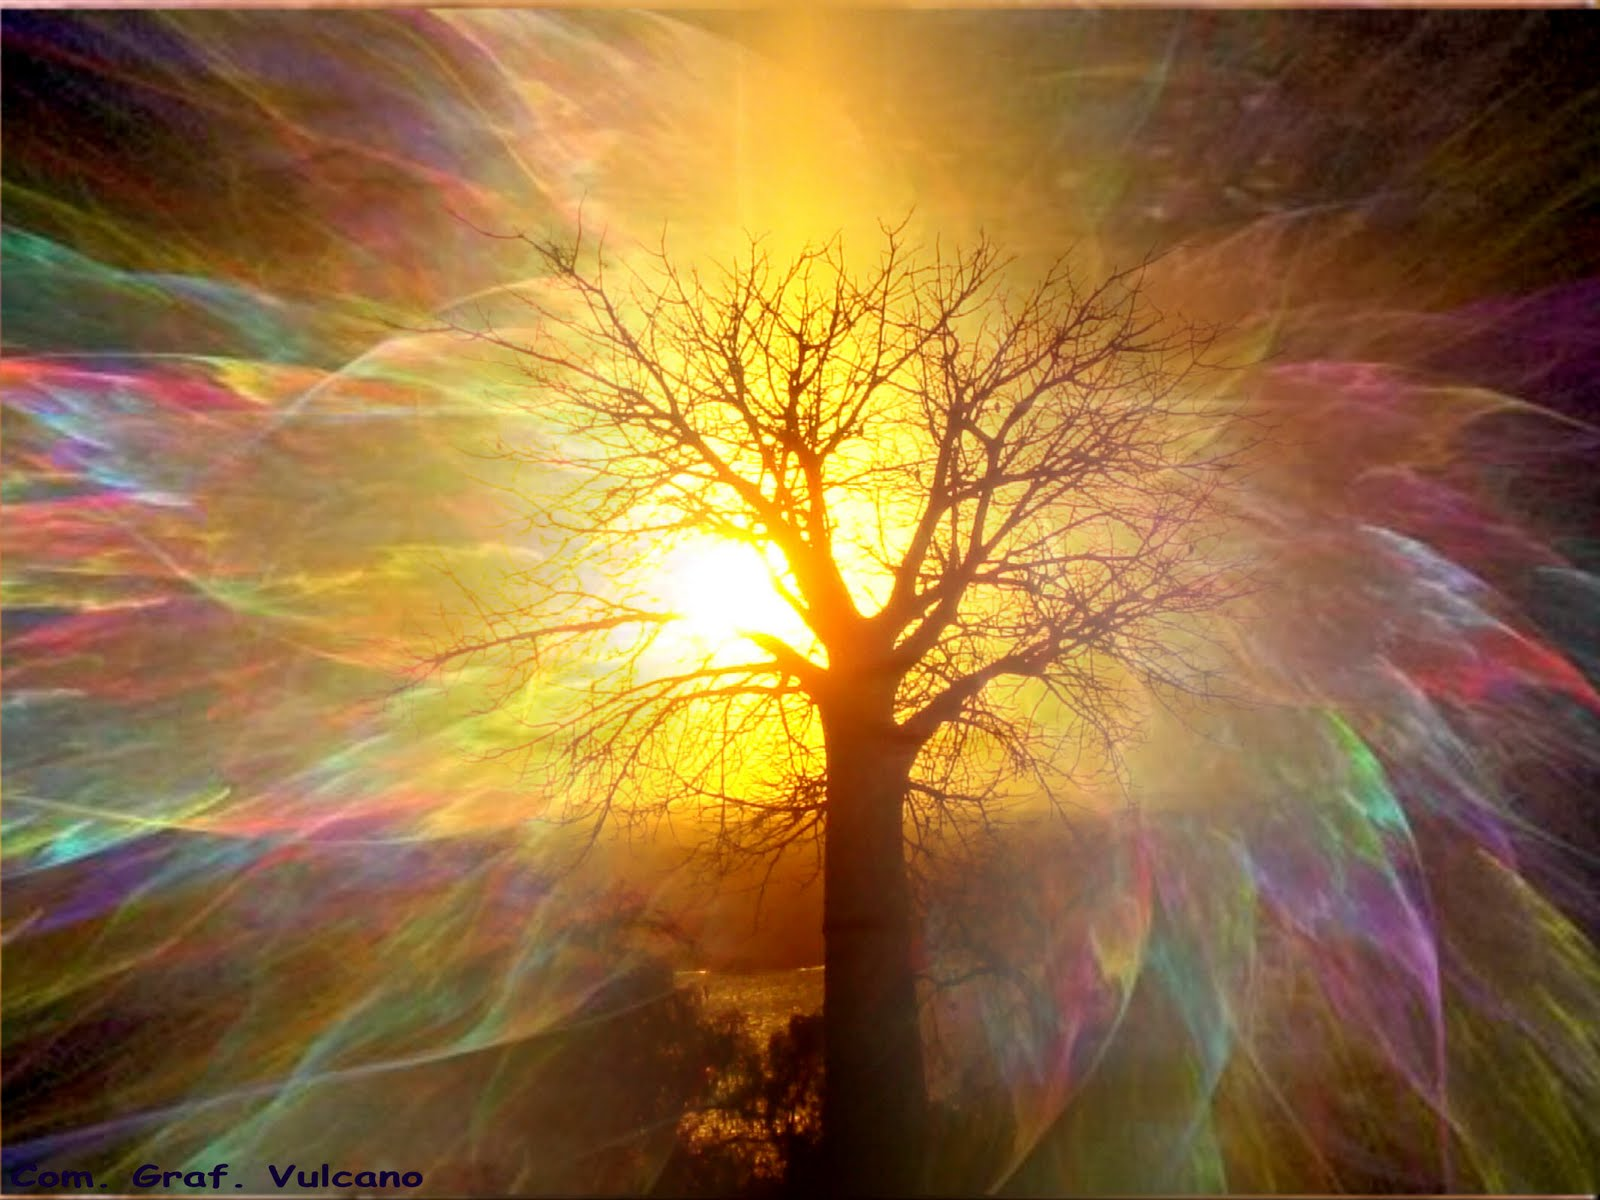 http://3.bp.blogspot.com/-3DKpeOoDV7U/Tm--e60NEaI/AAAAAAAAAGo/chmRQPBjTyA/s1600/luce-anima-ok.jpg